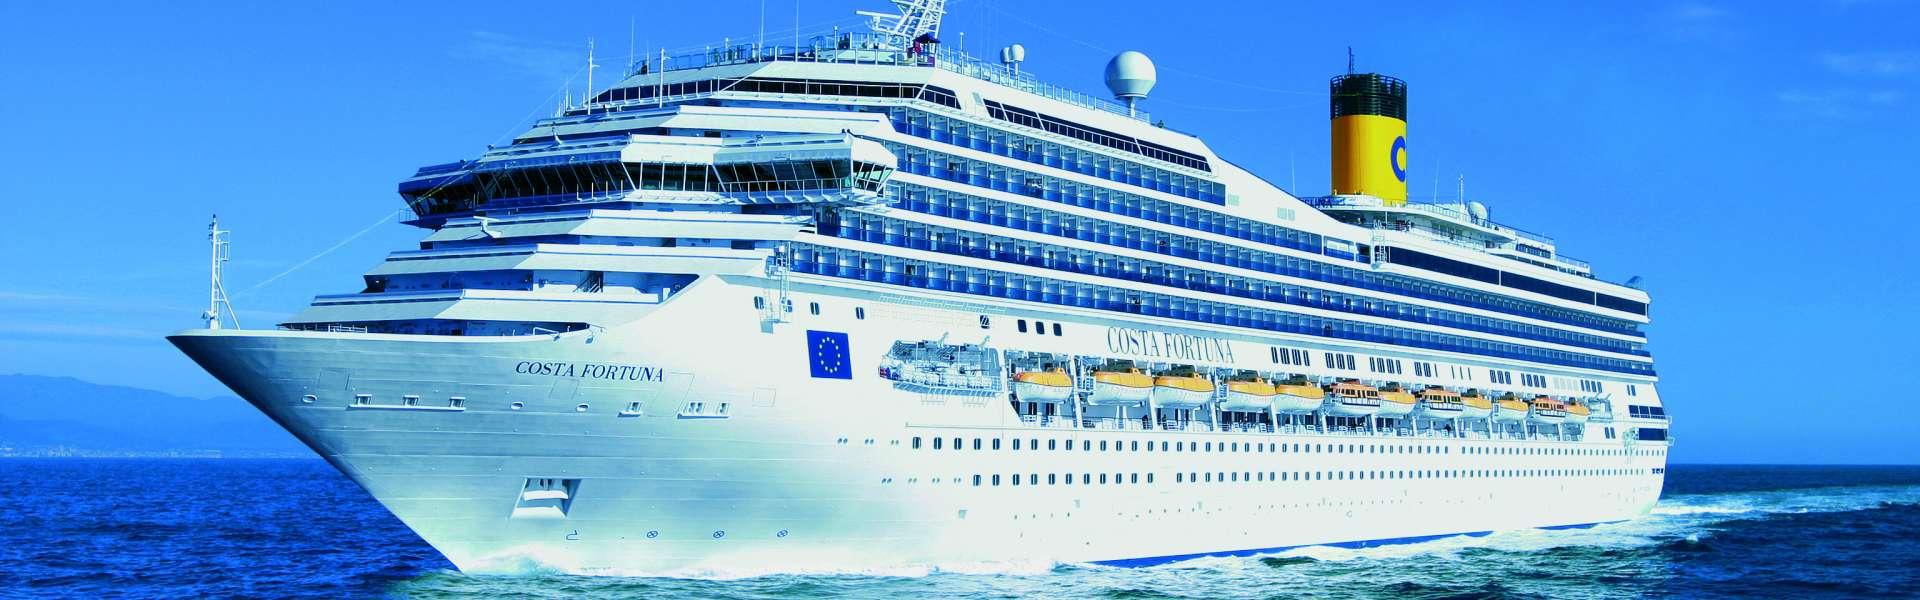 Croaziera 2019 - Mediterana de Vest (Barcelona) - Costa Cruises - Costa Fortuna - 7 nopti